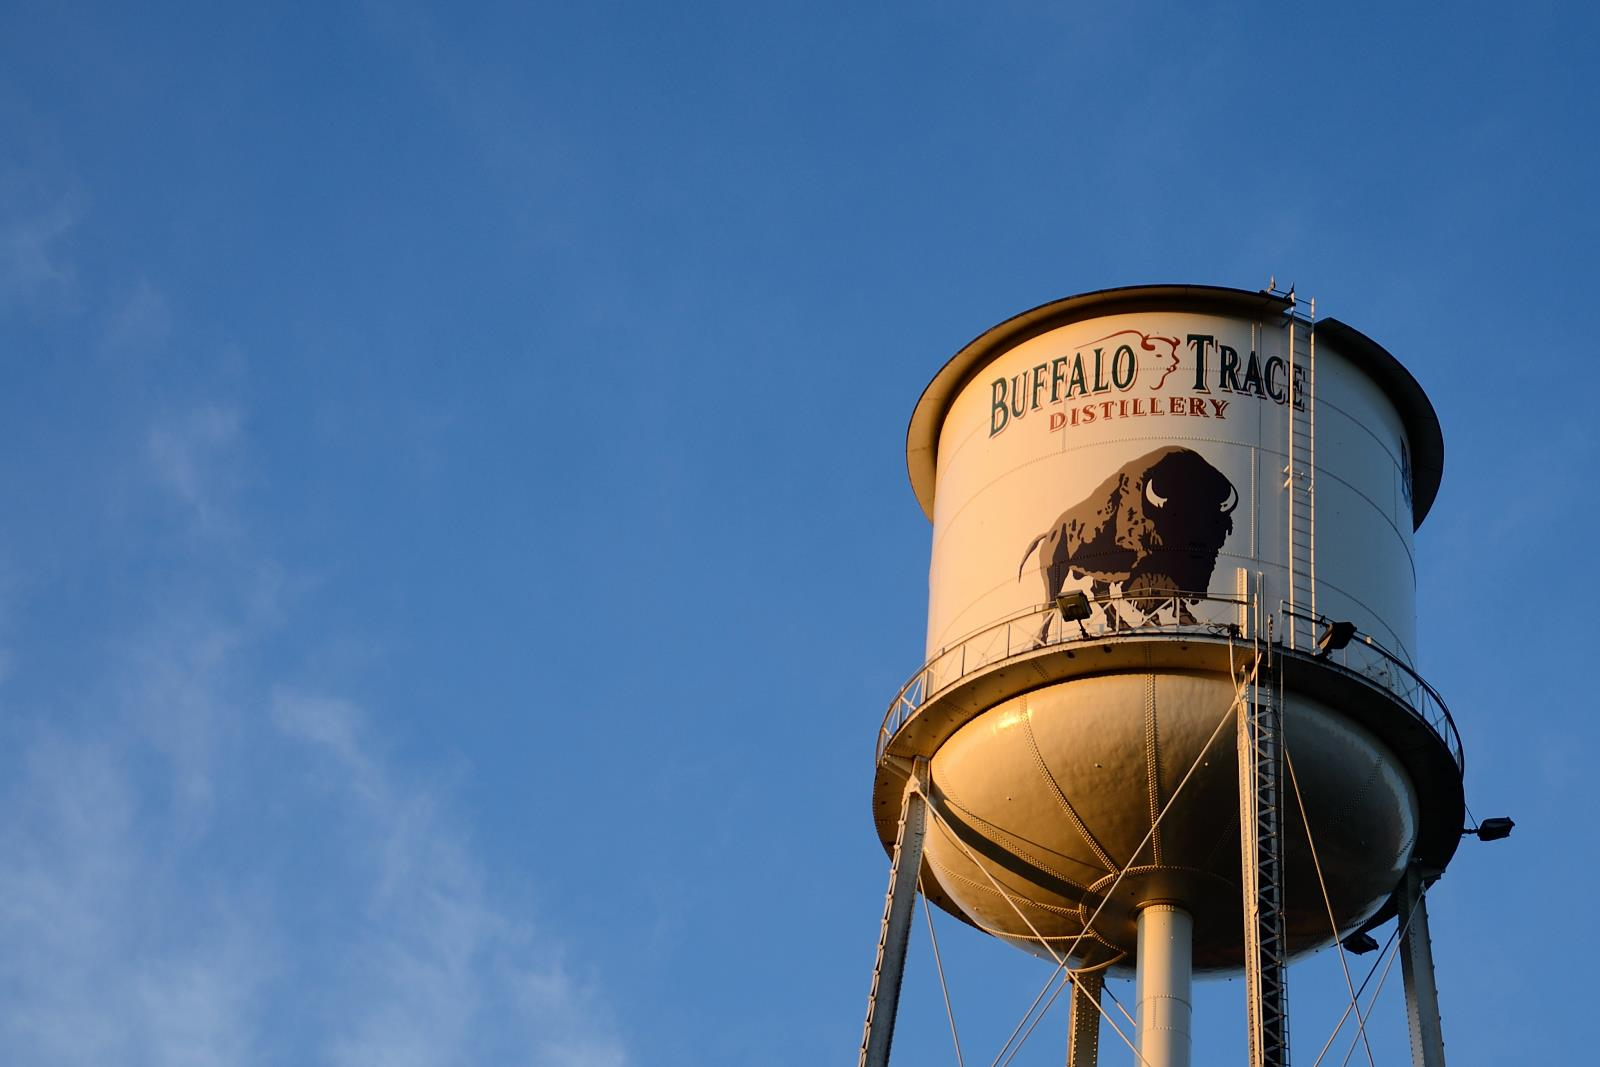 Buffalo Trace Distillery - Wikipedia